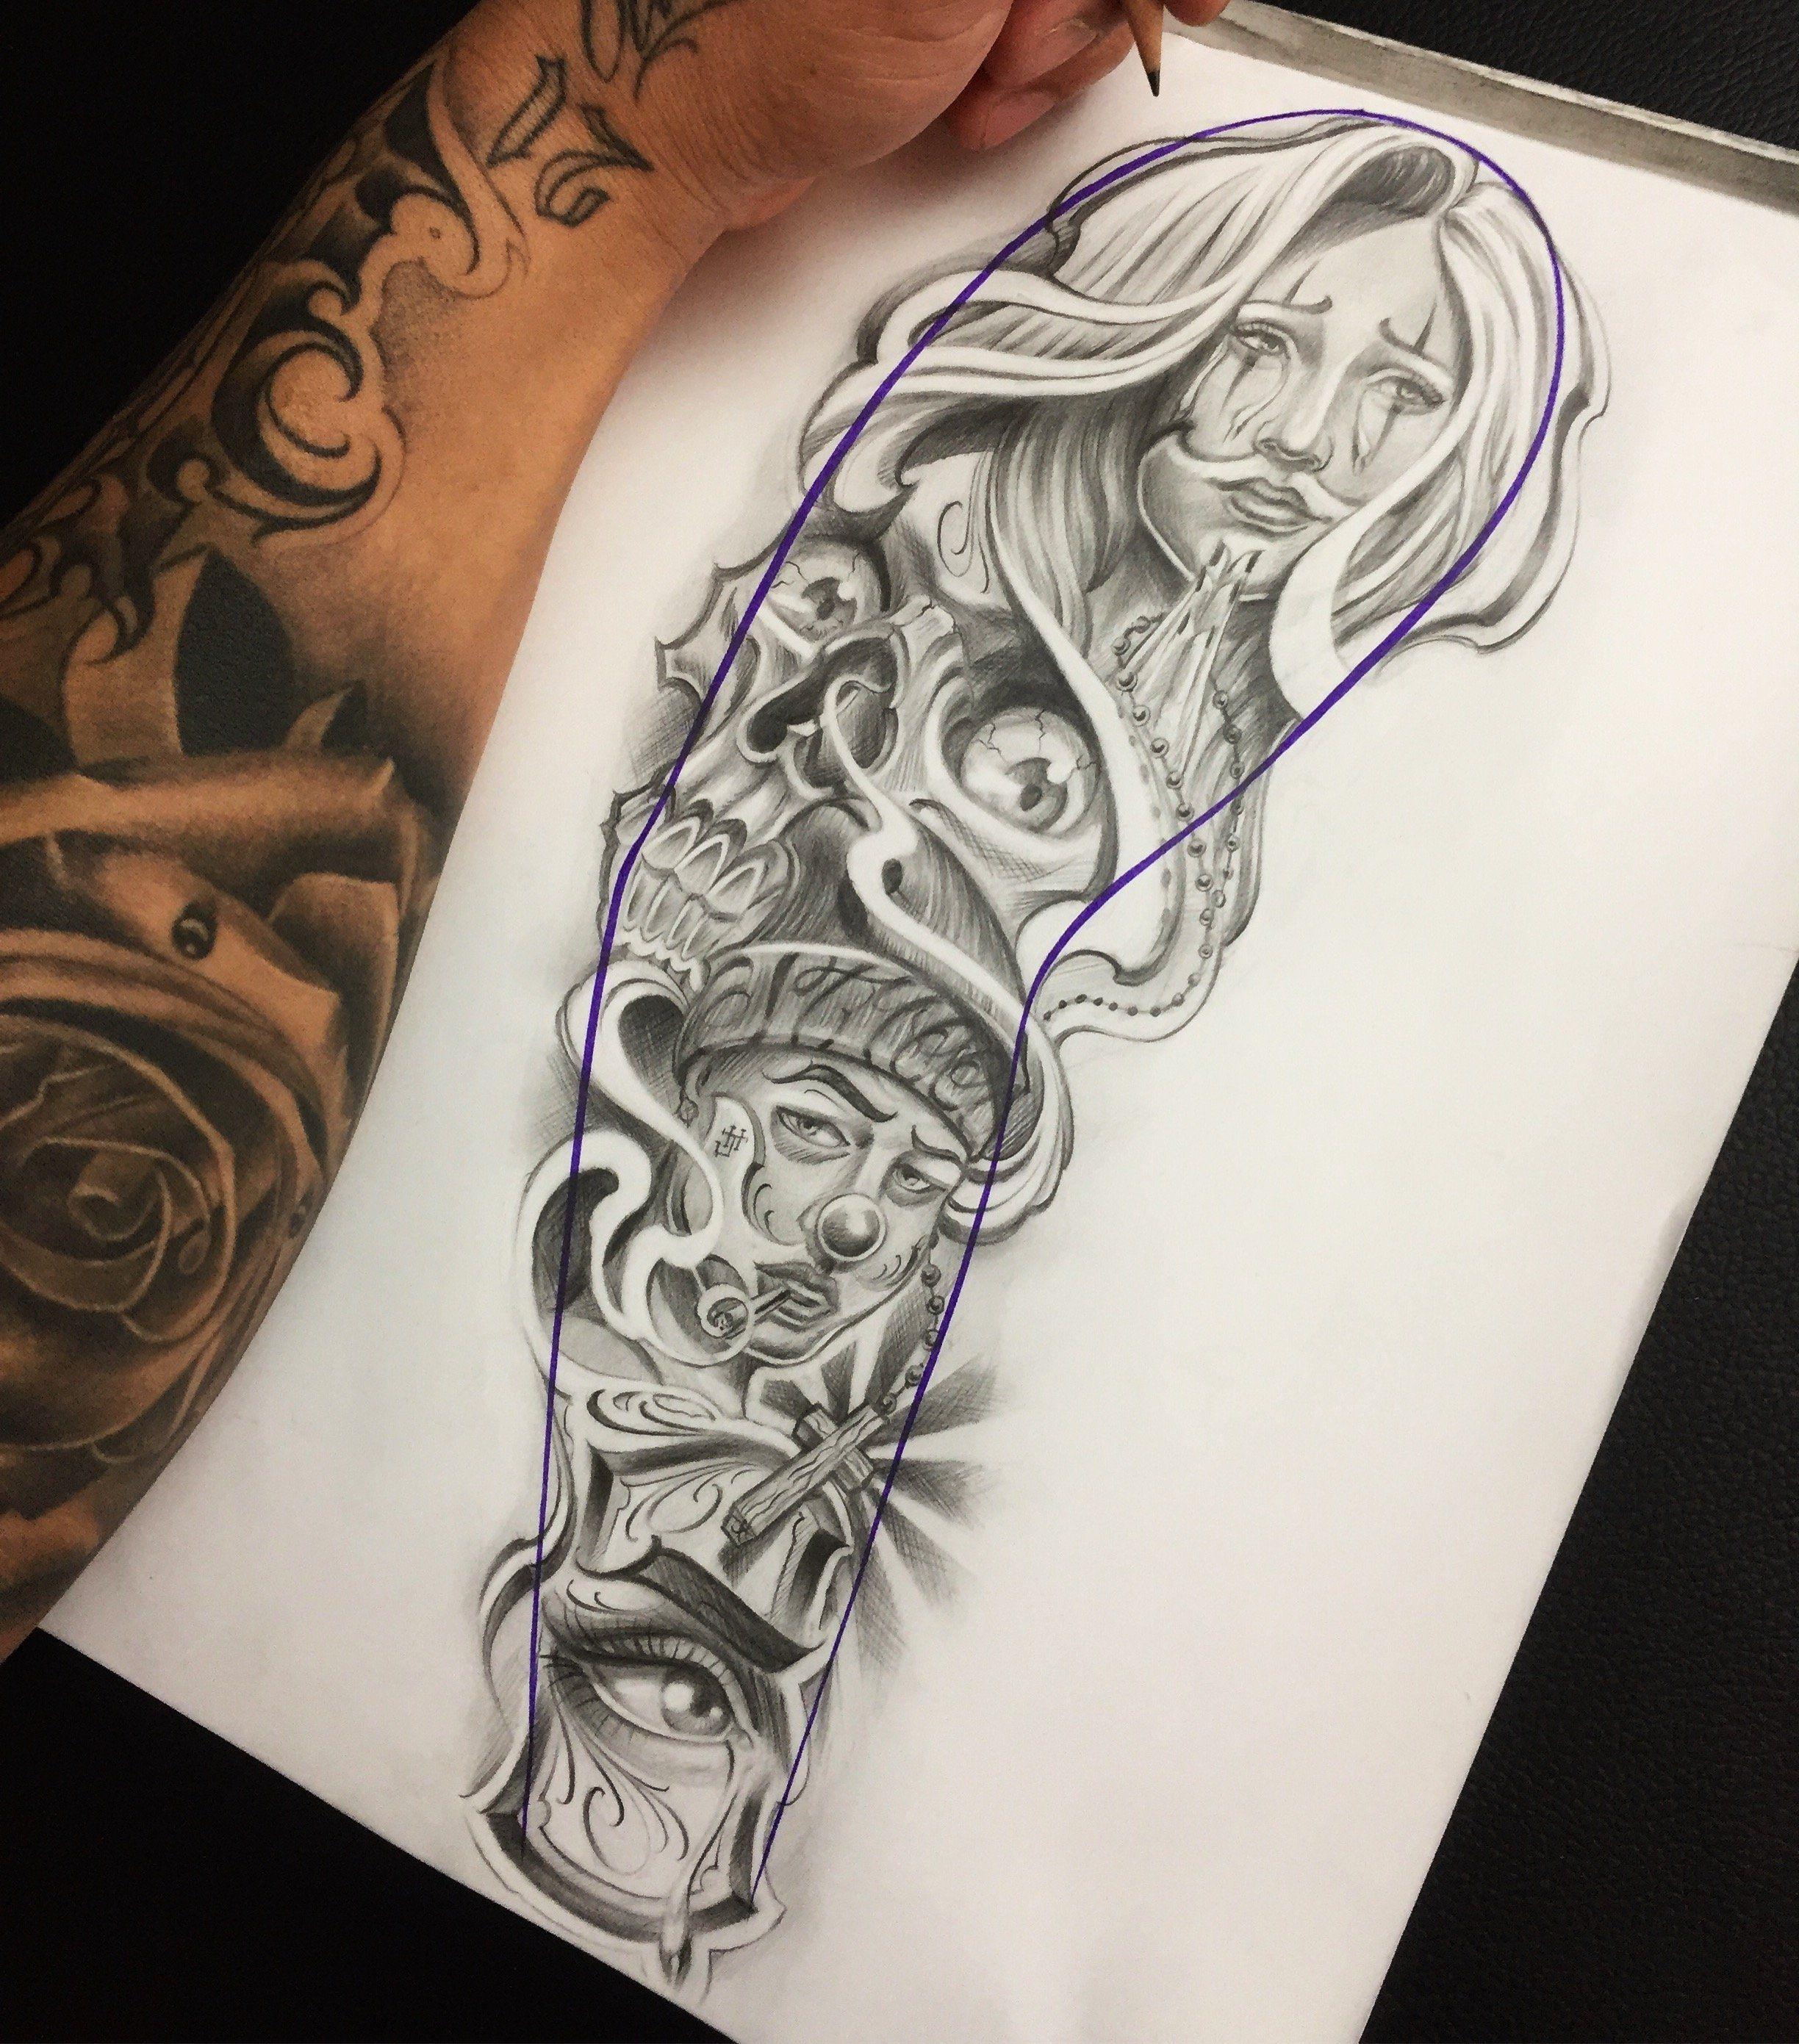 Chicano Sleeve Tattoo Design Tattoo Design Download 1 Chicano Tattoos Sleeve Tattoo Designs Sleeve Tattoos For Women